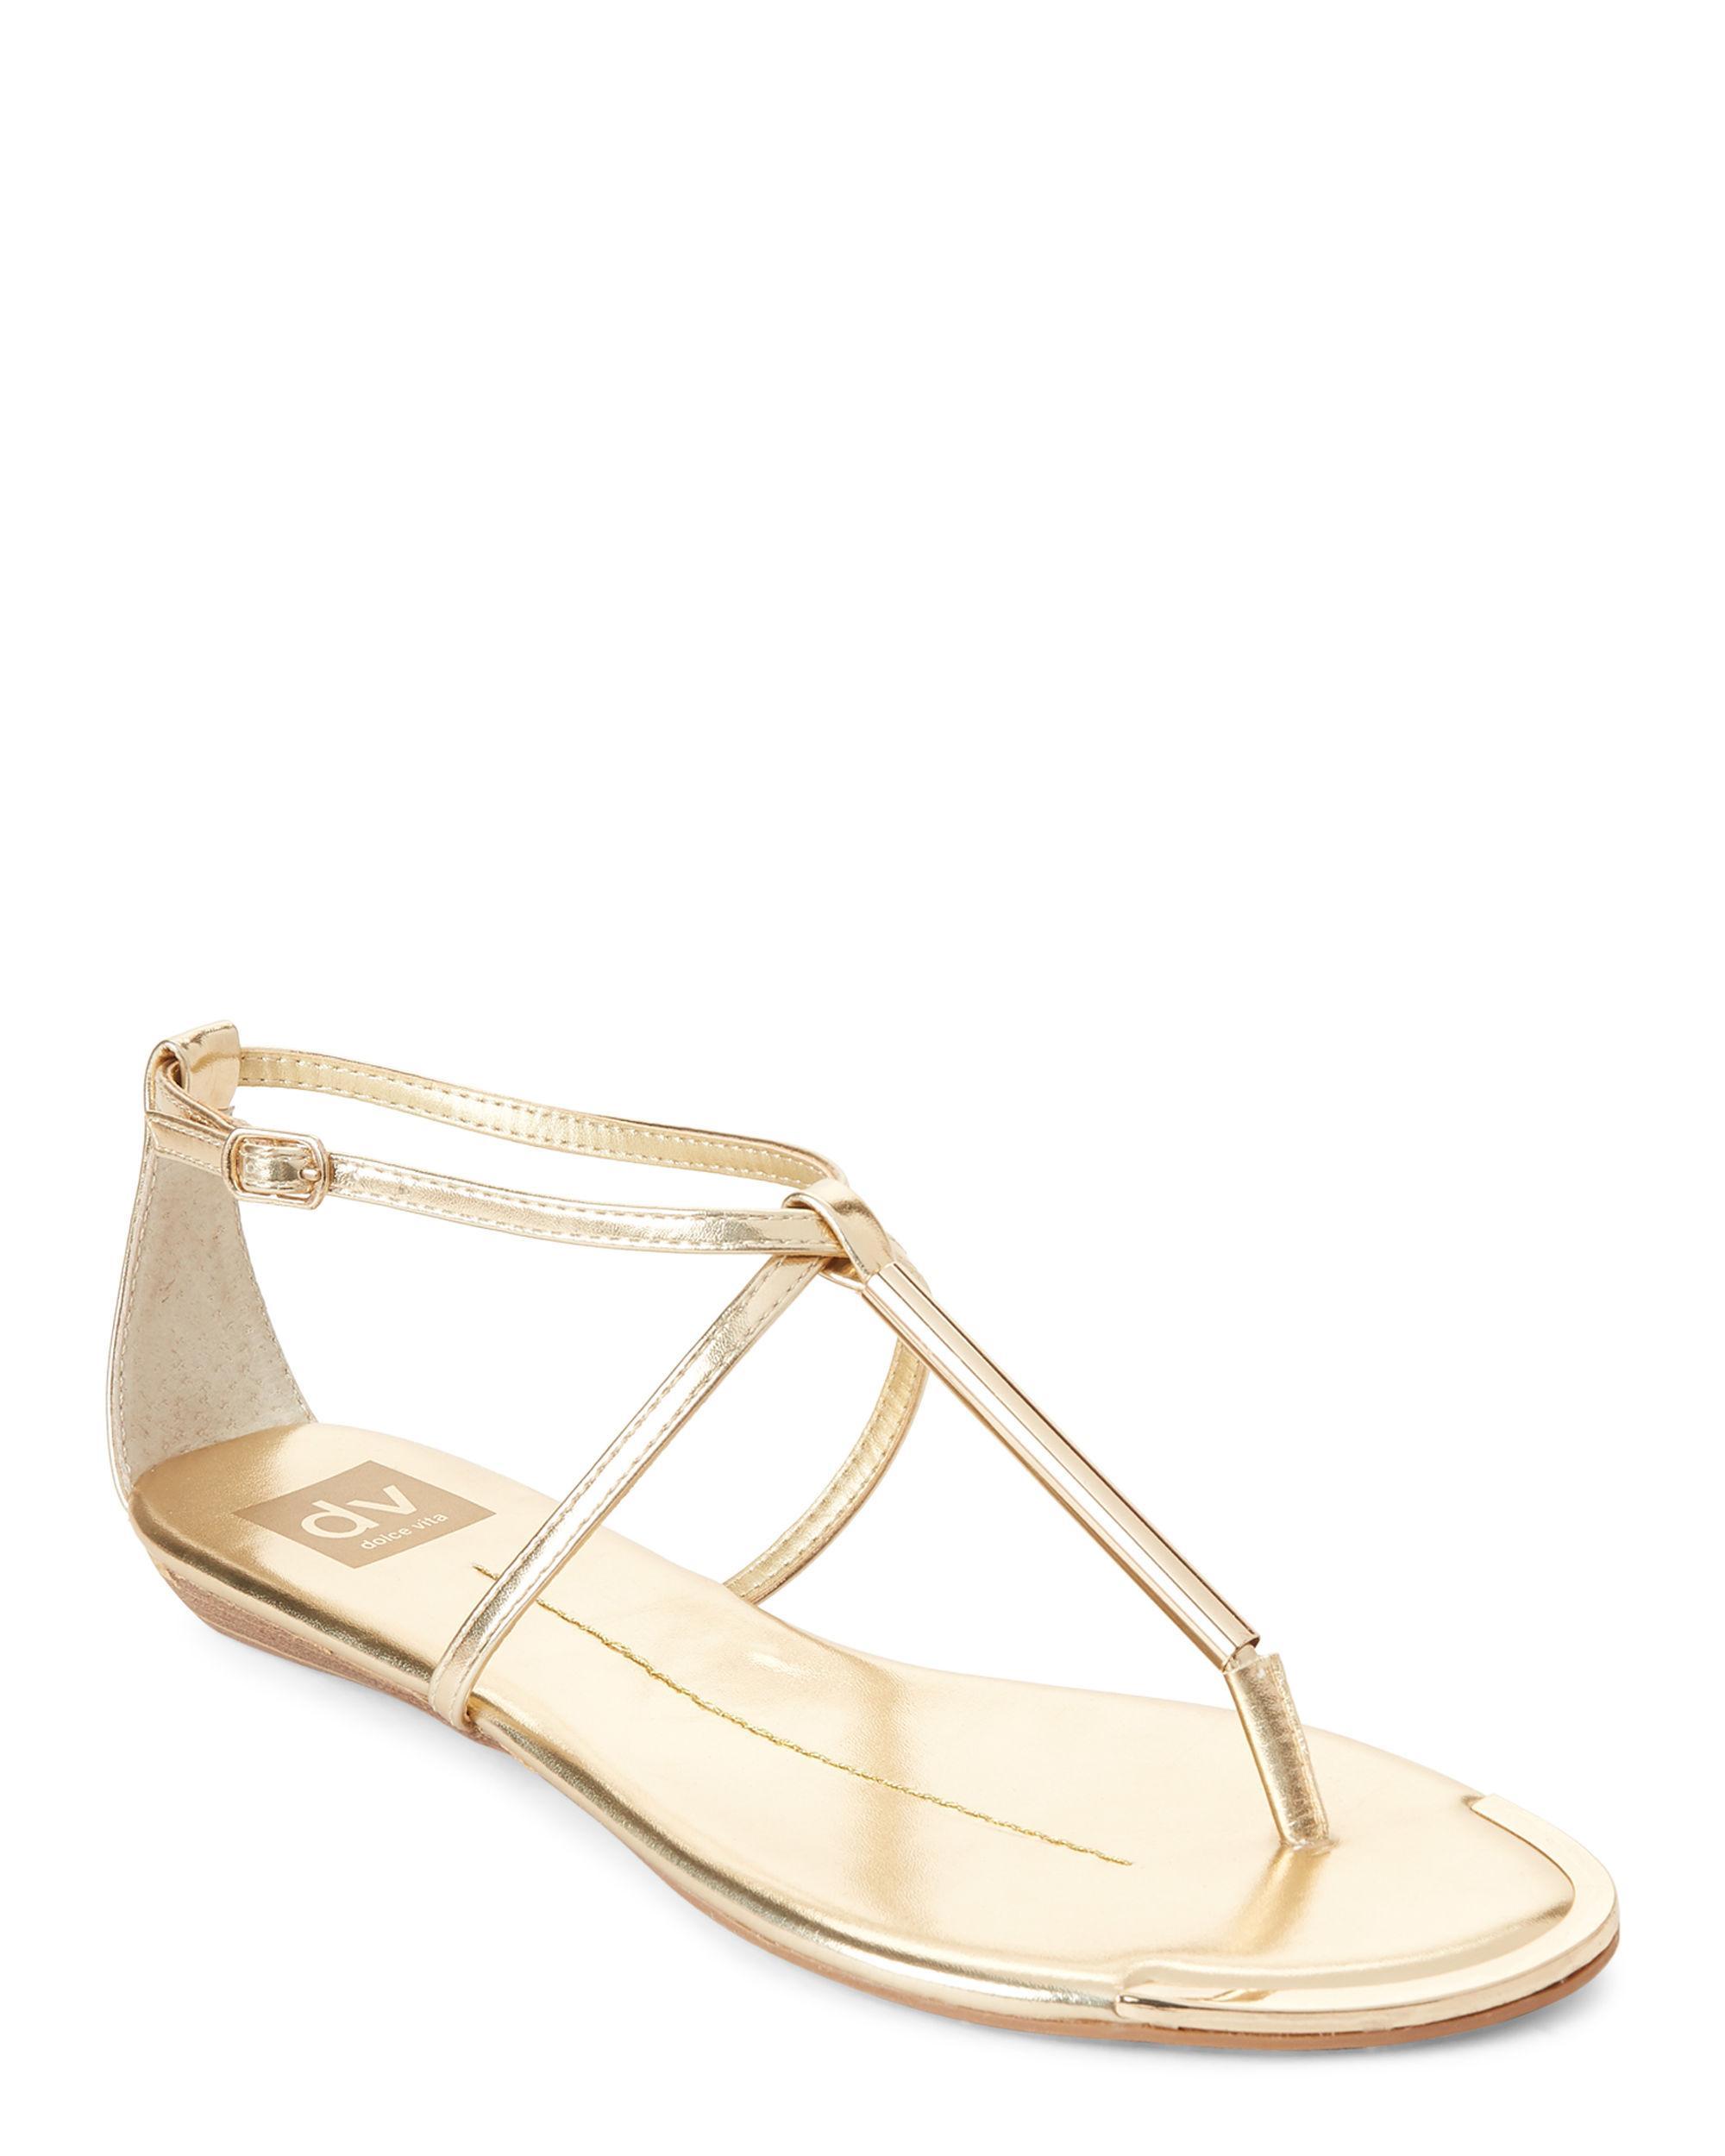 182ba8923 Lyst - DV by Dolce Vita Gold Metallic Archer Flat Sandals in Metallic